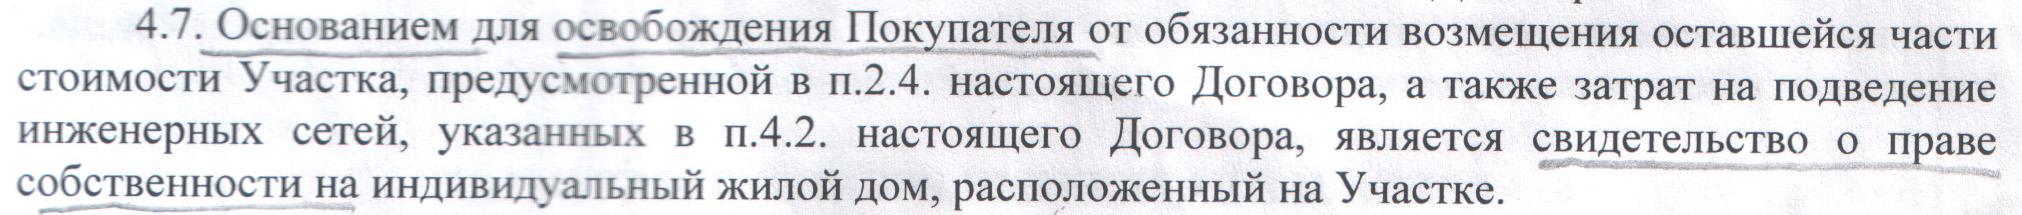 договор 21